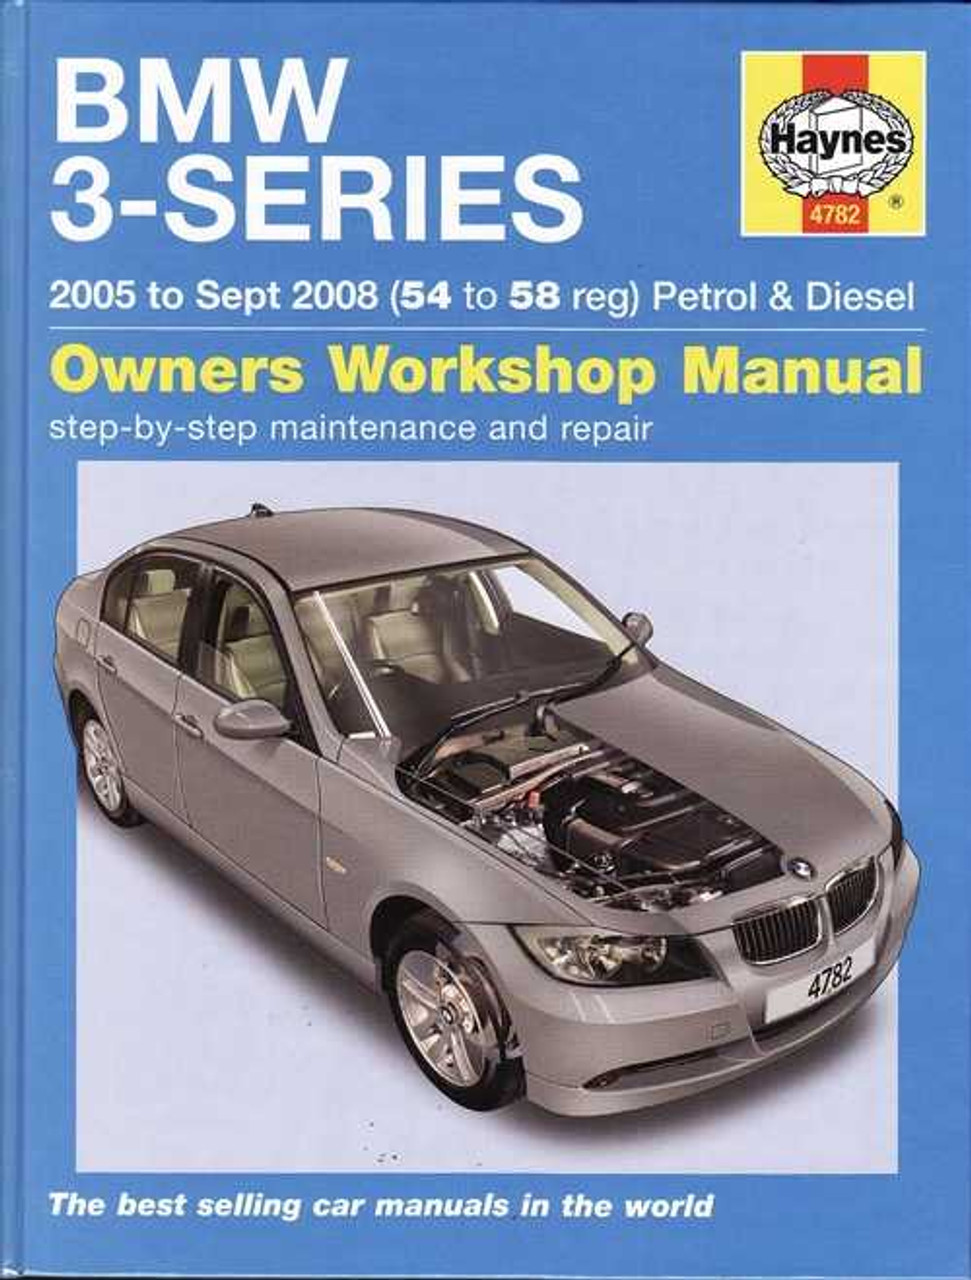 3 series e90 e91 petrol and diesel 2005 2008 workshop manual bmw 3 series e90 e91 petrol and diesel 2005 2008 workshop manual sciox Gallery